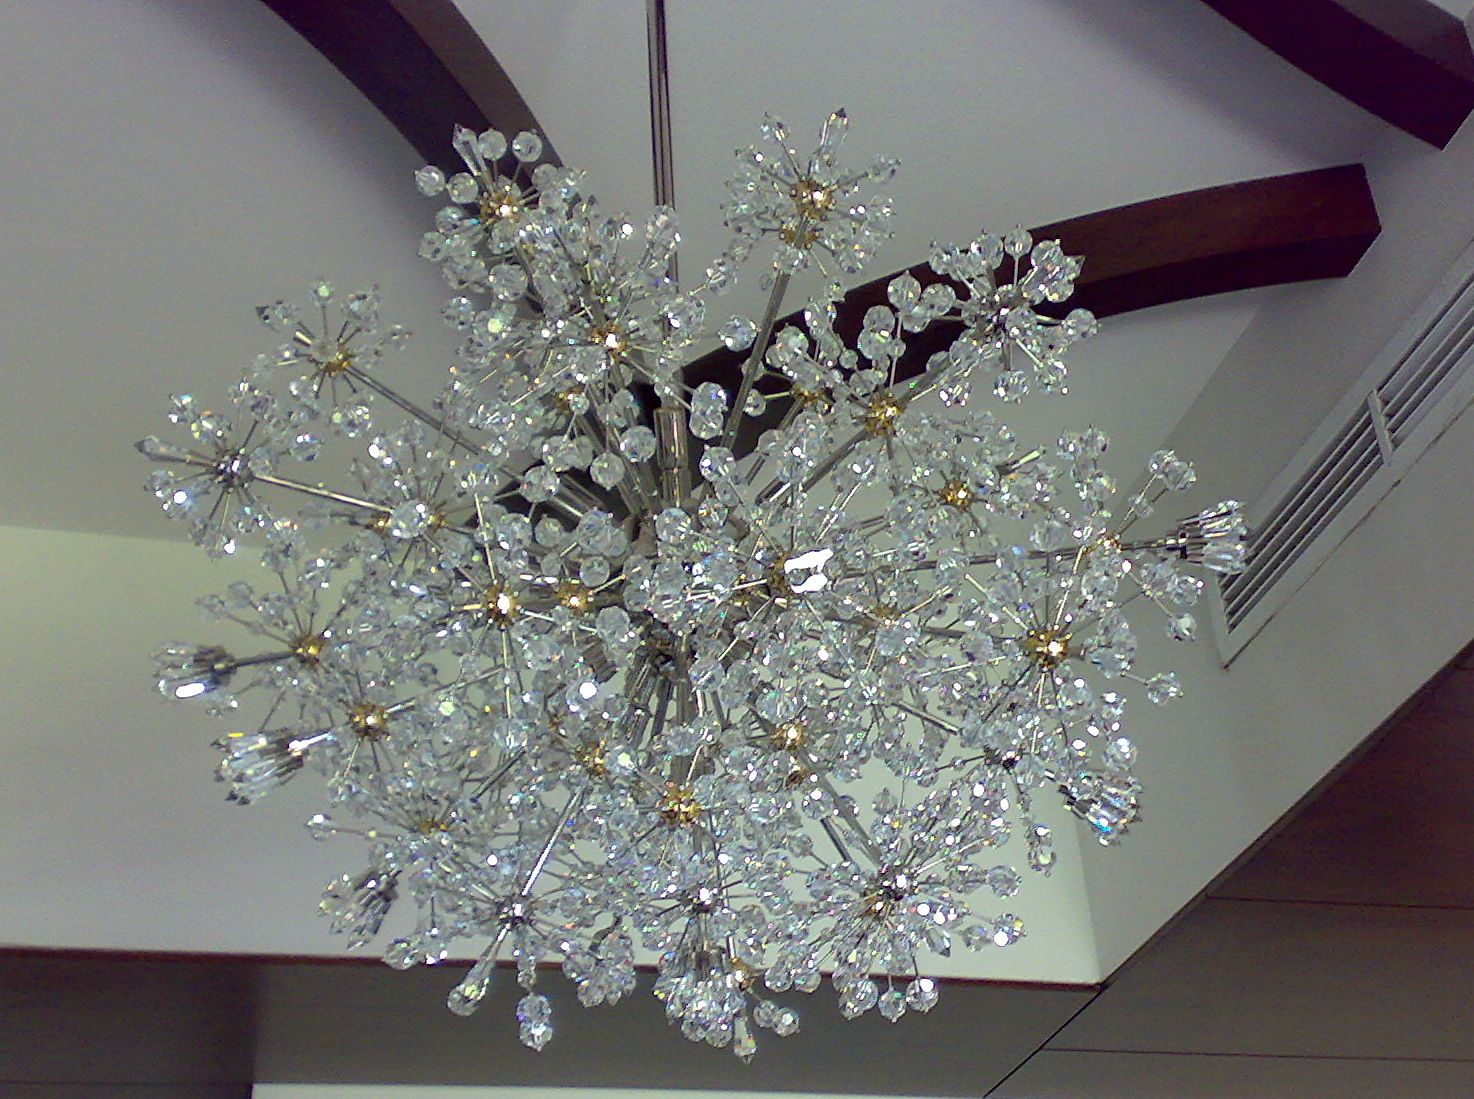 Beautiful swarovski crystal chandelier faustig modell 65000 beautiful swarovski crystal chandelier faustig modell 65000 arubaitofo Images